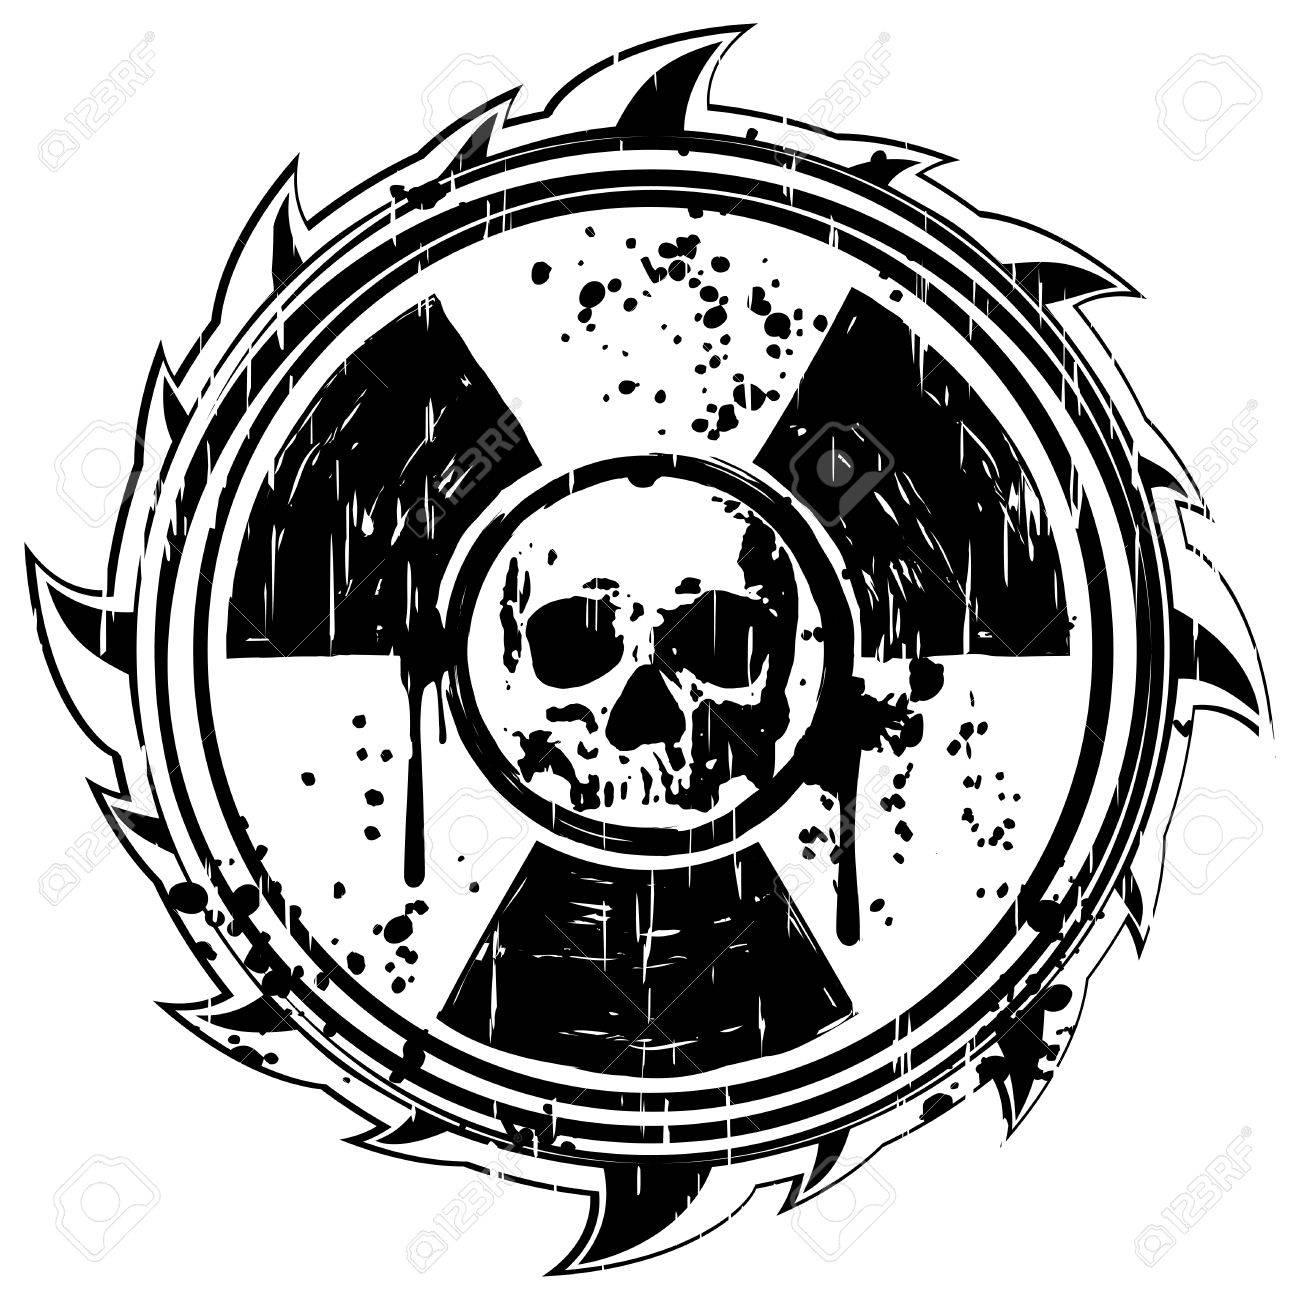 abstract vector illustration grunge frame black skull and symbol Radioactive Water abstract vector illustration grunge frame black skull and symbol radiation stock vector 71453540